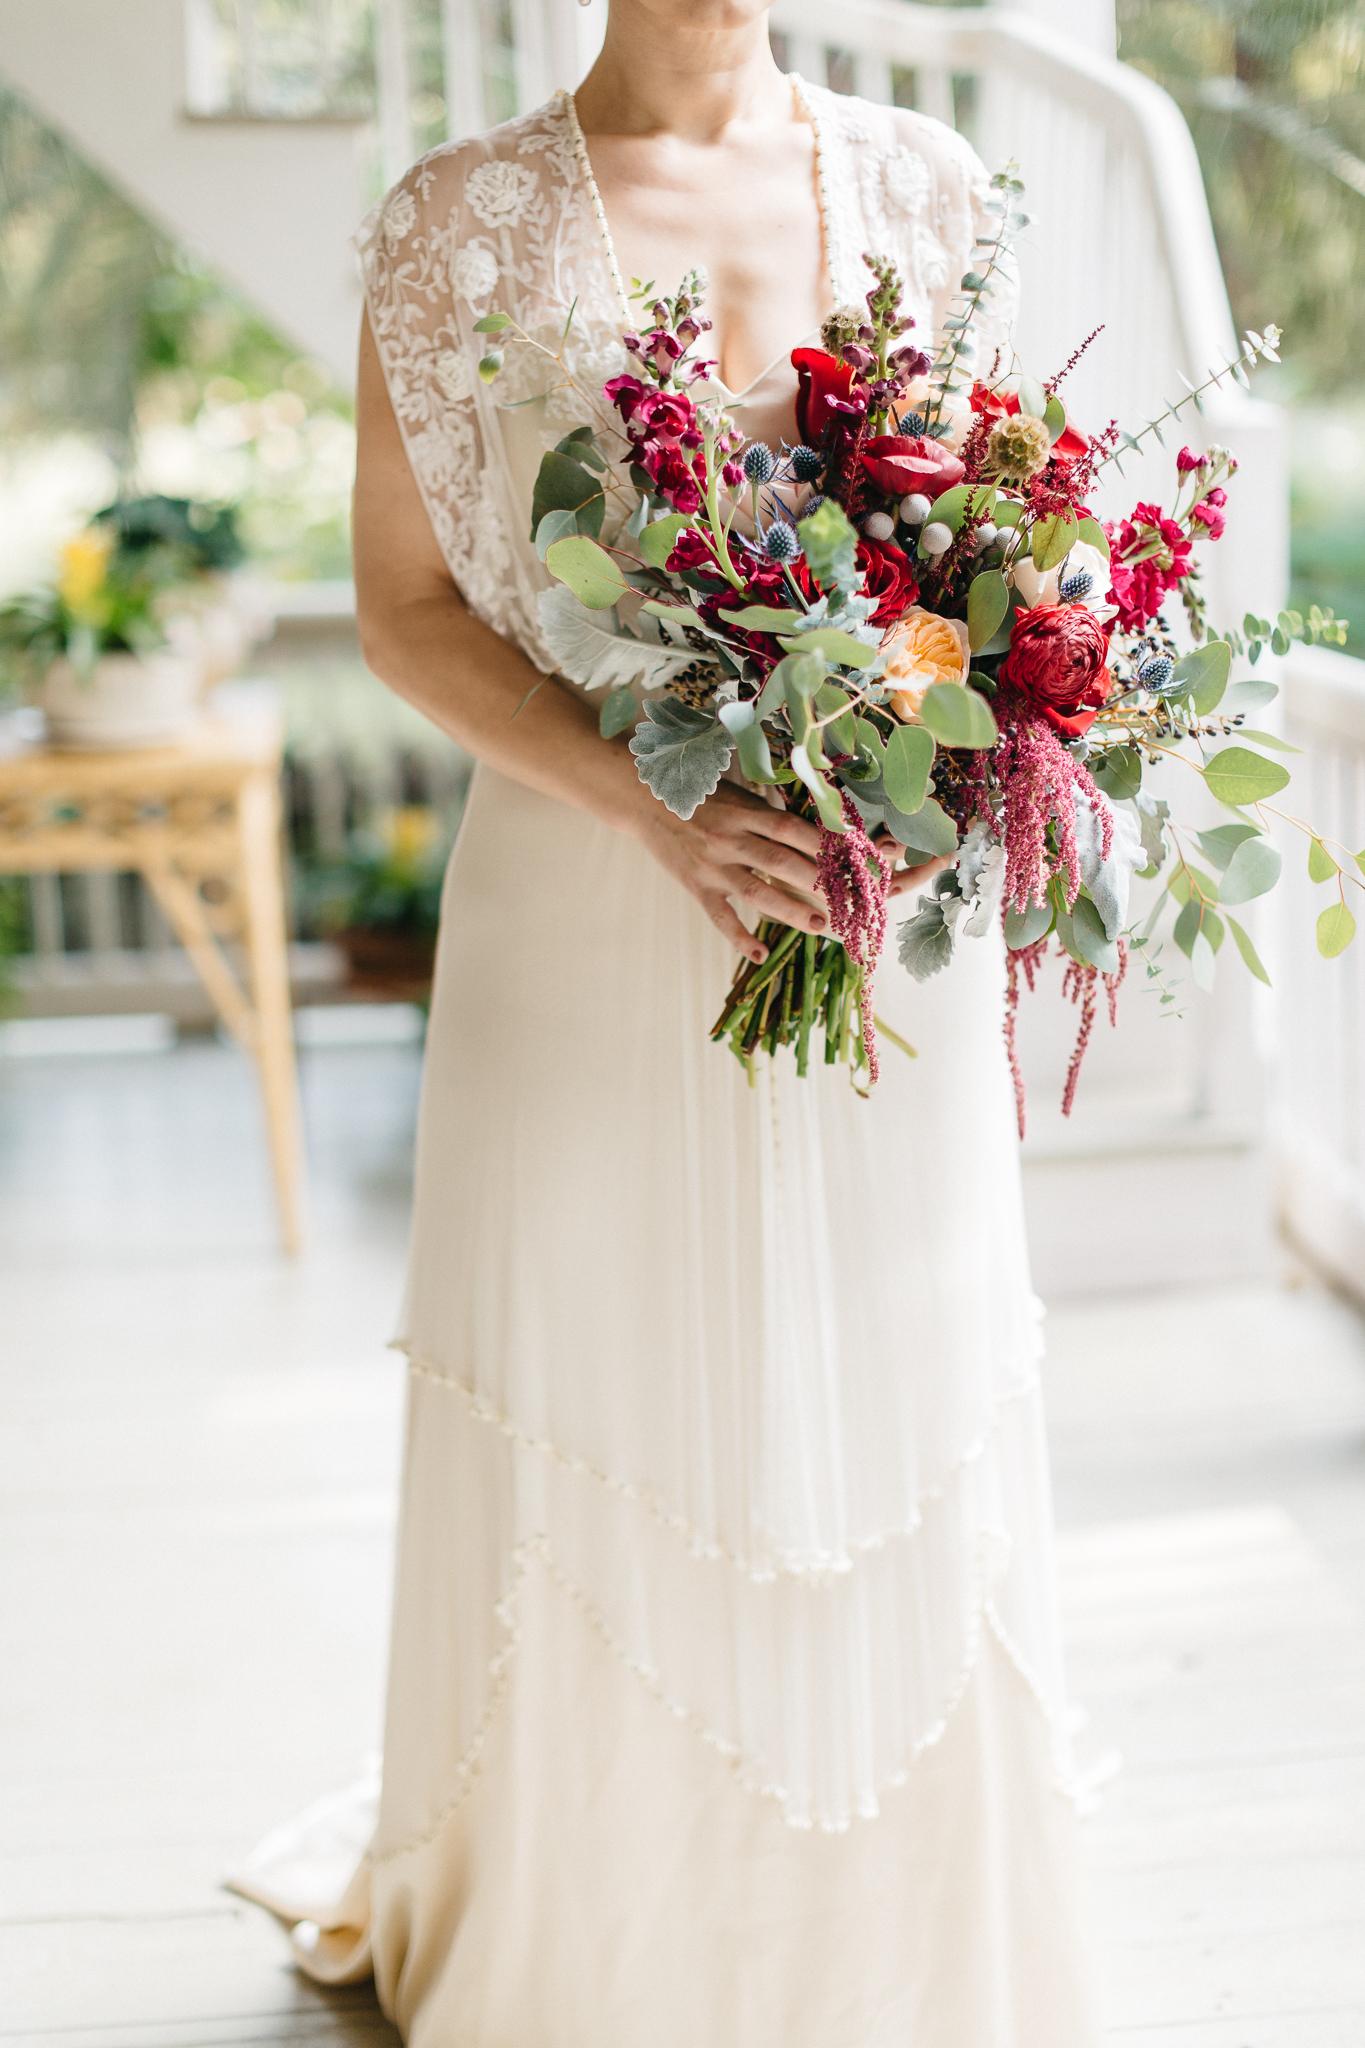 Southern Fete, Southern Wedding, Flowers by Rodney, Bride, Wedding dress, Maison Madeleine, Mark Aycock Photography